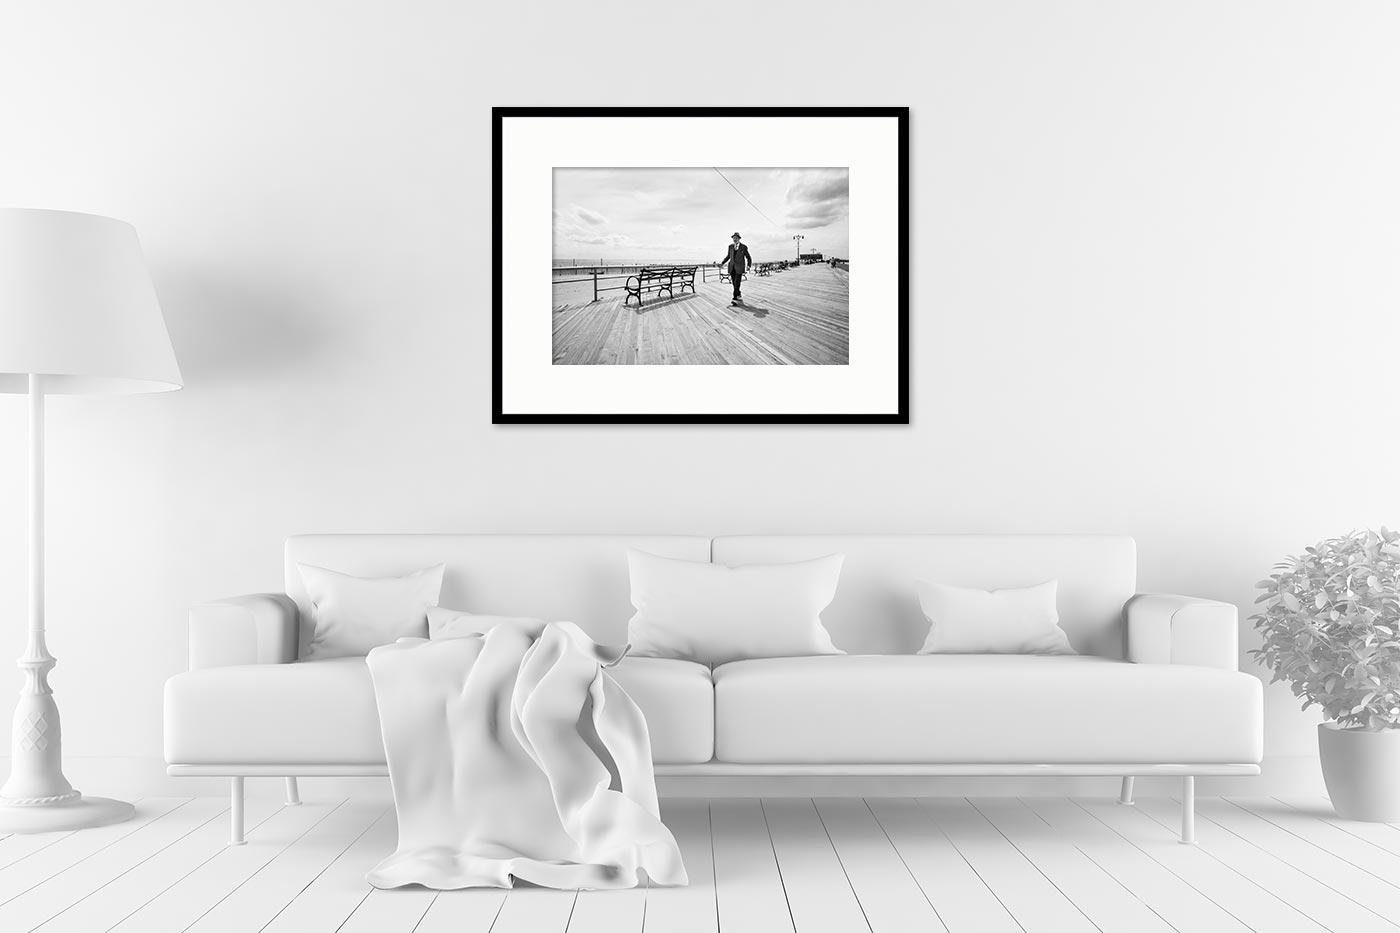 Cadre galerie 60x80 Coney Island Man